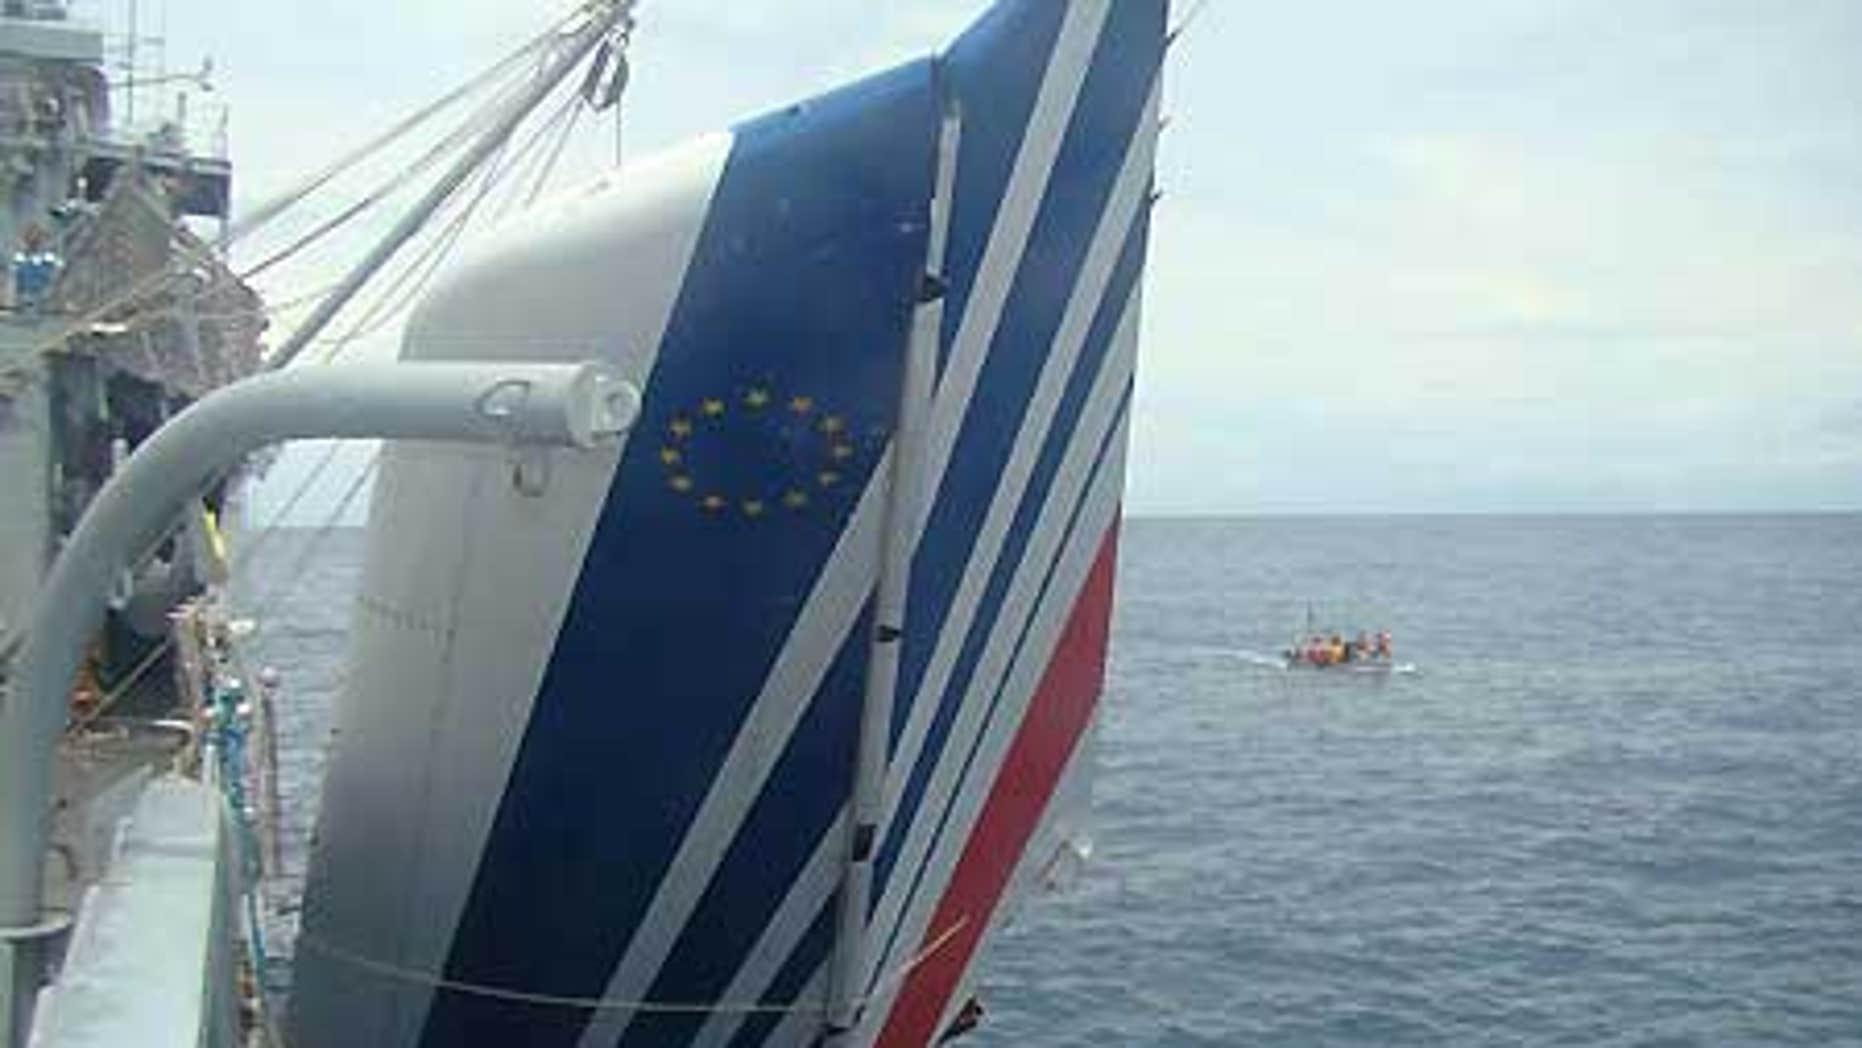 June 9: Brazil's Navy sailors recover debris of the missing Air France Flight 447 from the Atlantic Ocean.